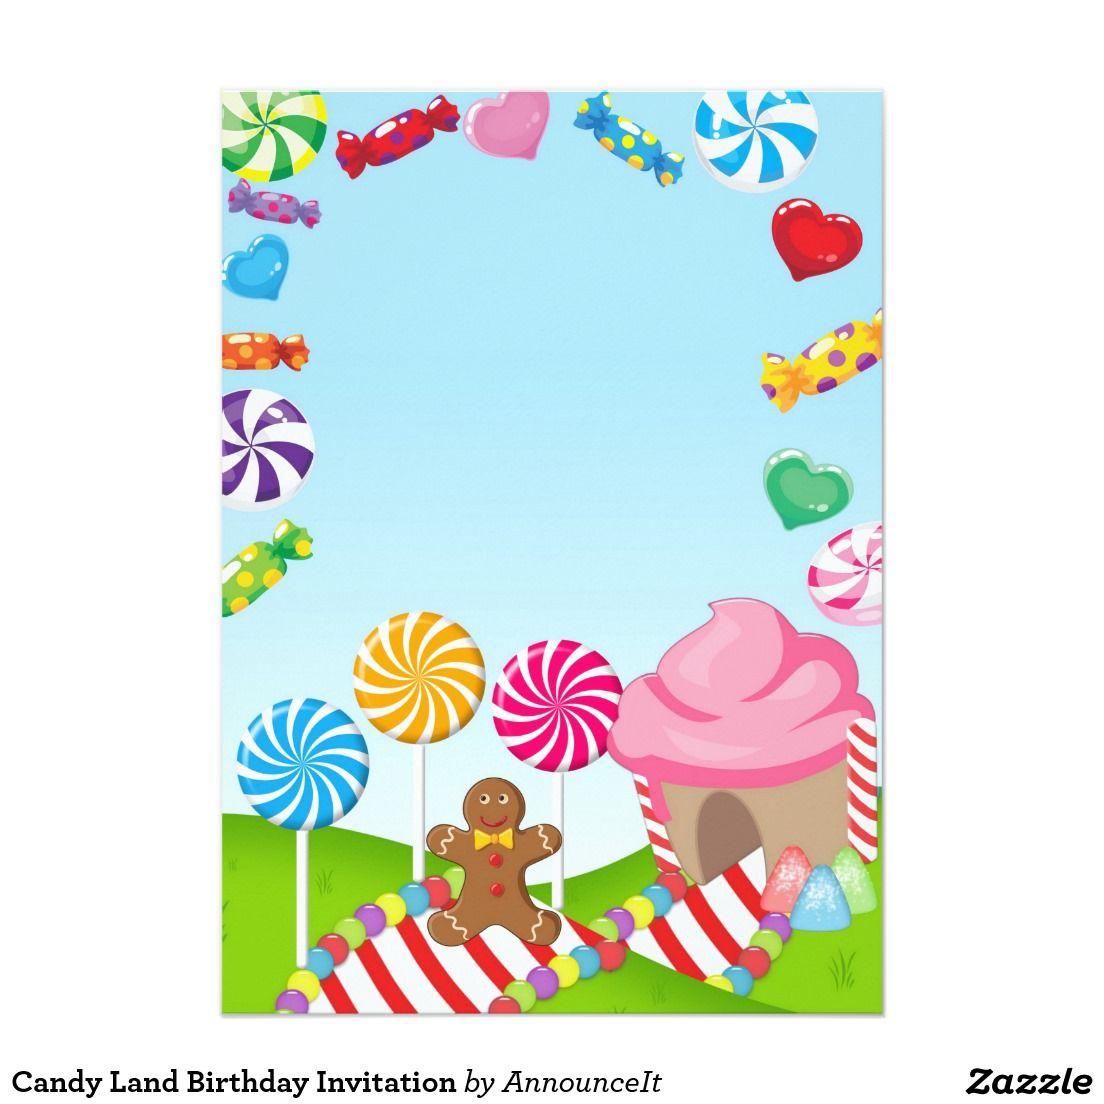 Candy Land Birthday Invitation – Candyland Birthday Party Invitations